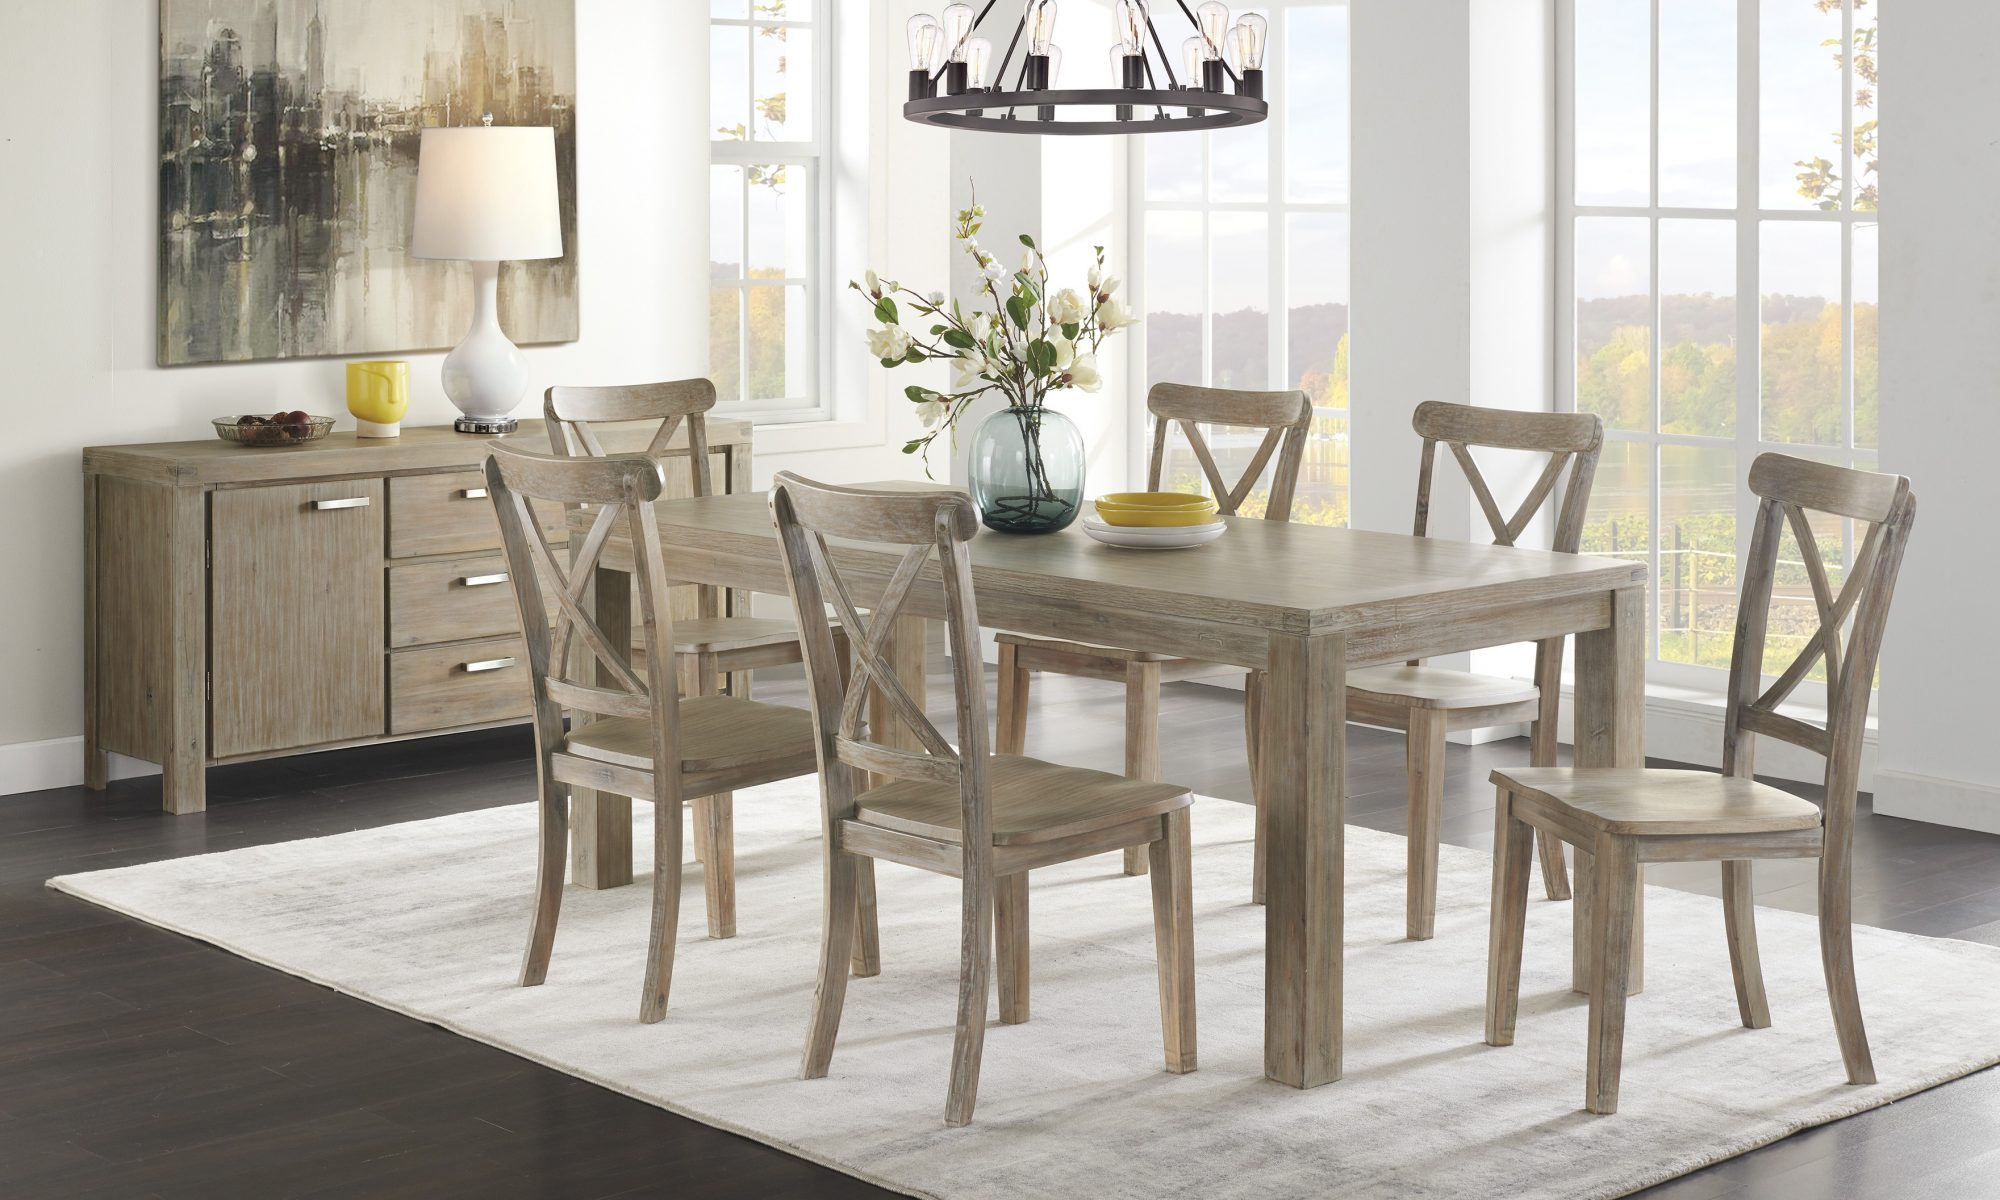 Stylowe meble stołowe 5169, www.stylowemebleplock.pl